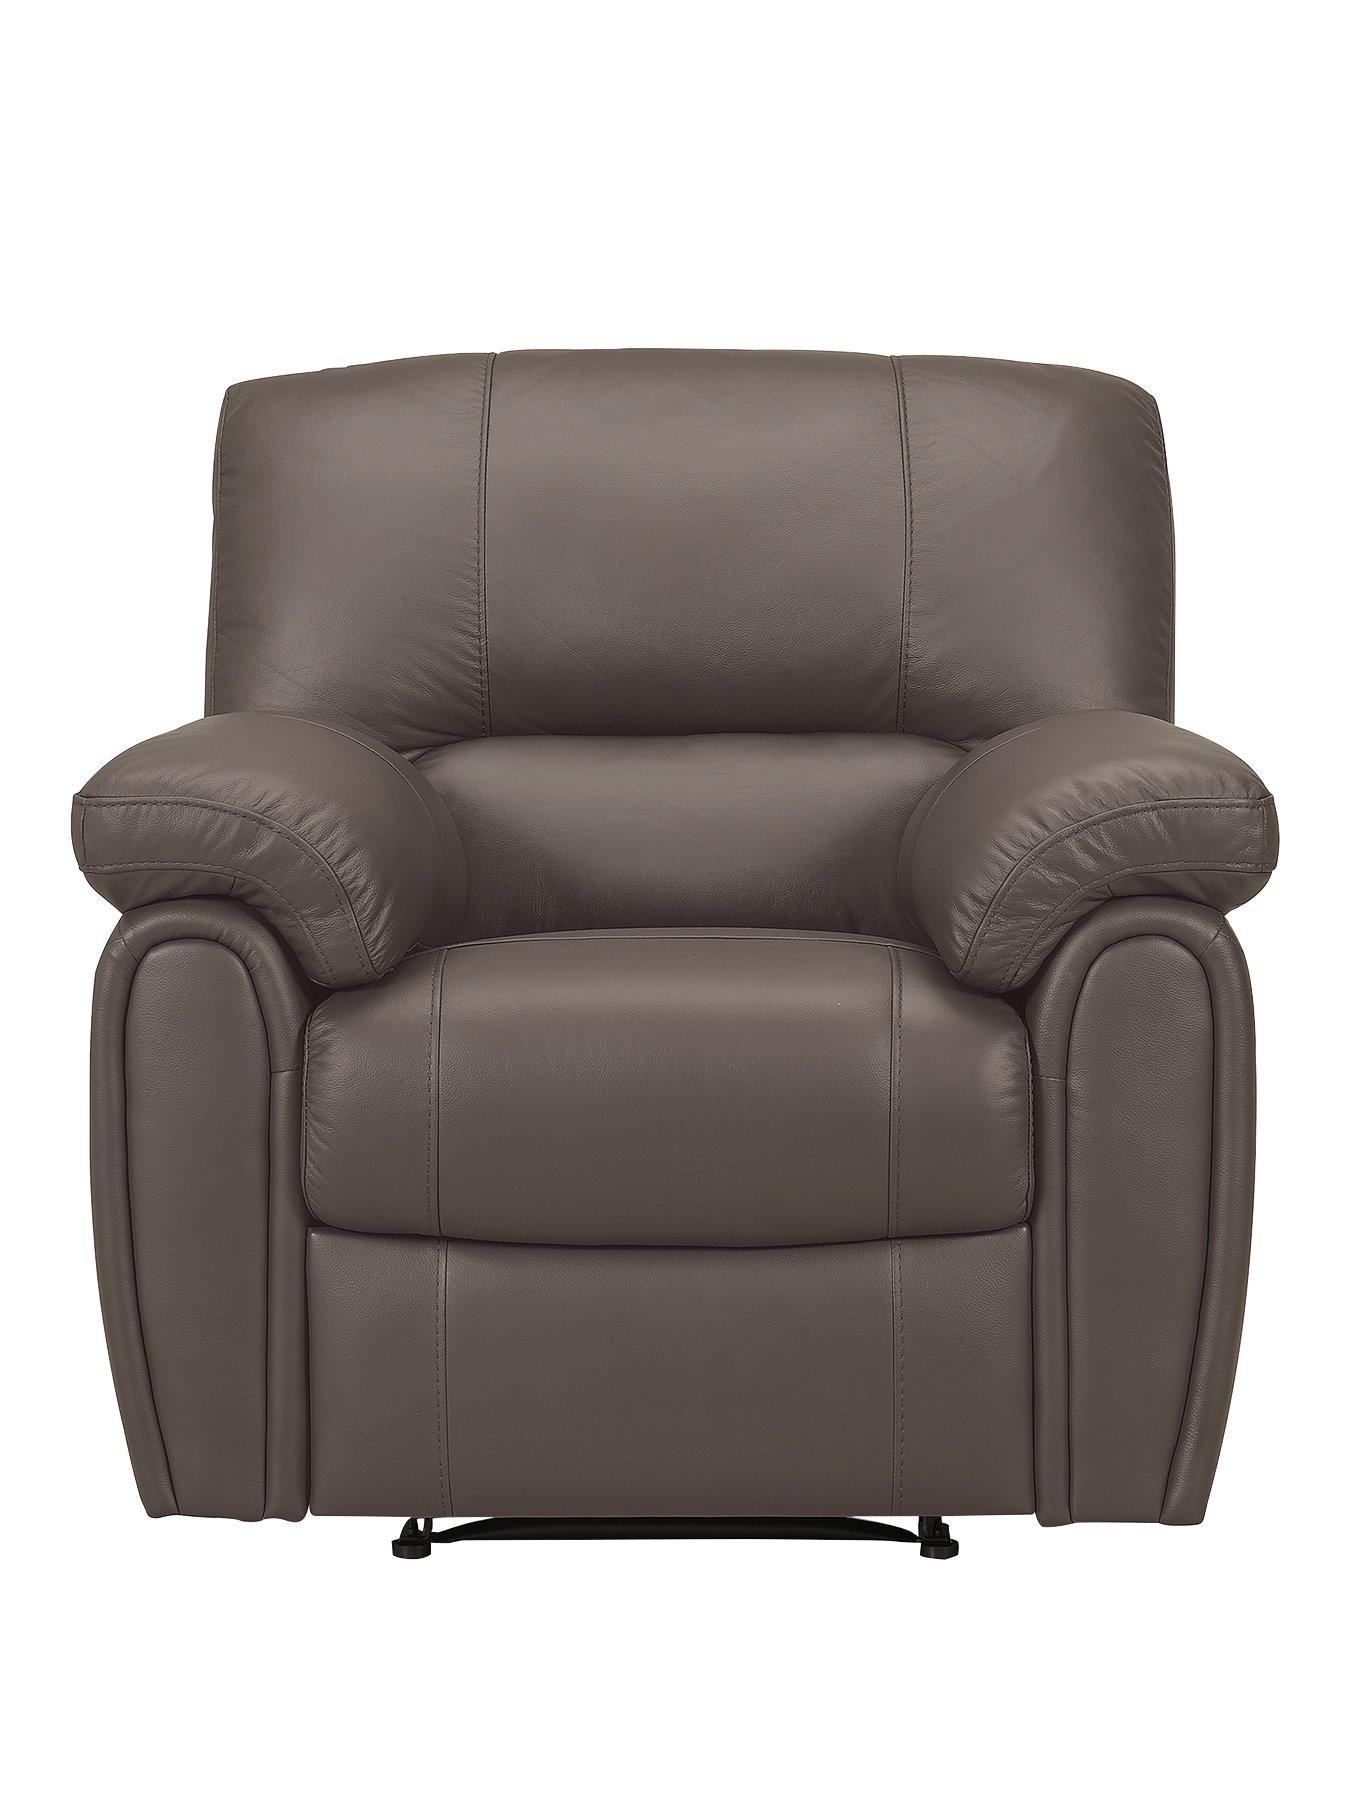 nike blazer burgundy leather recliner